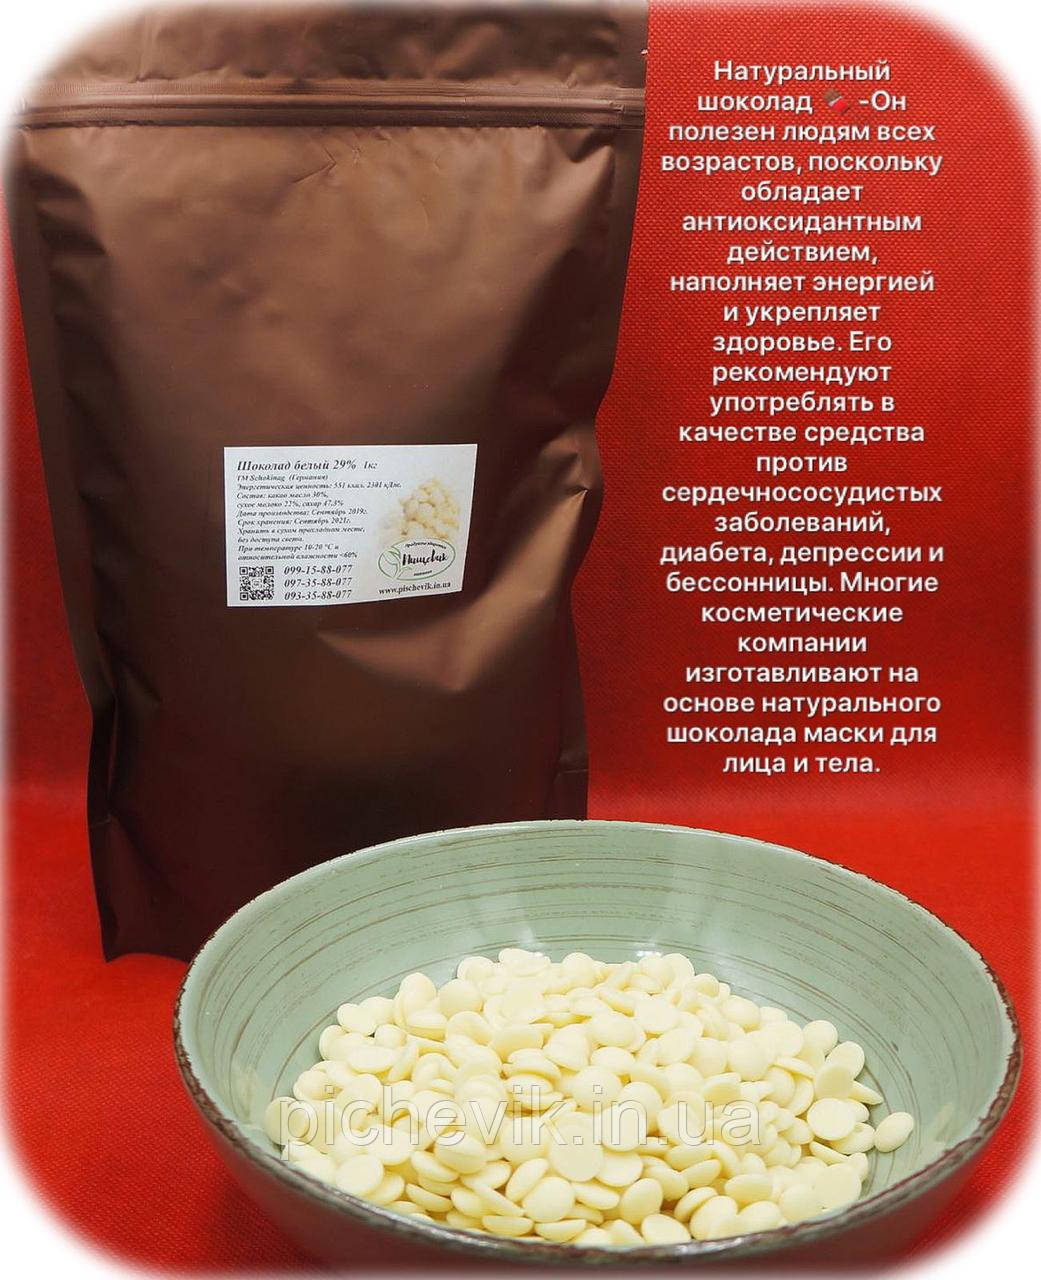 Шоколад белый 29% ТМ Schokinag (Германия) Вес: 500 гр